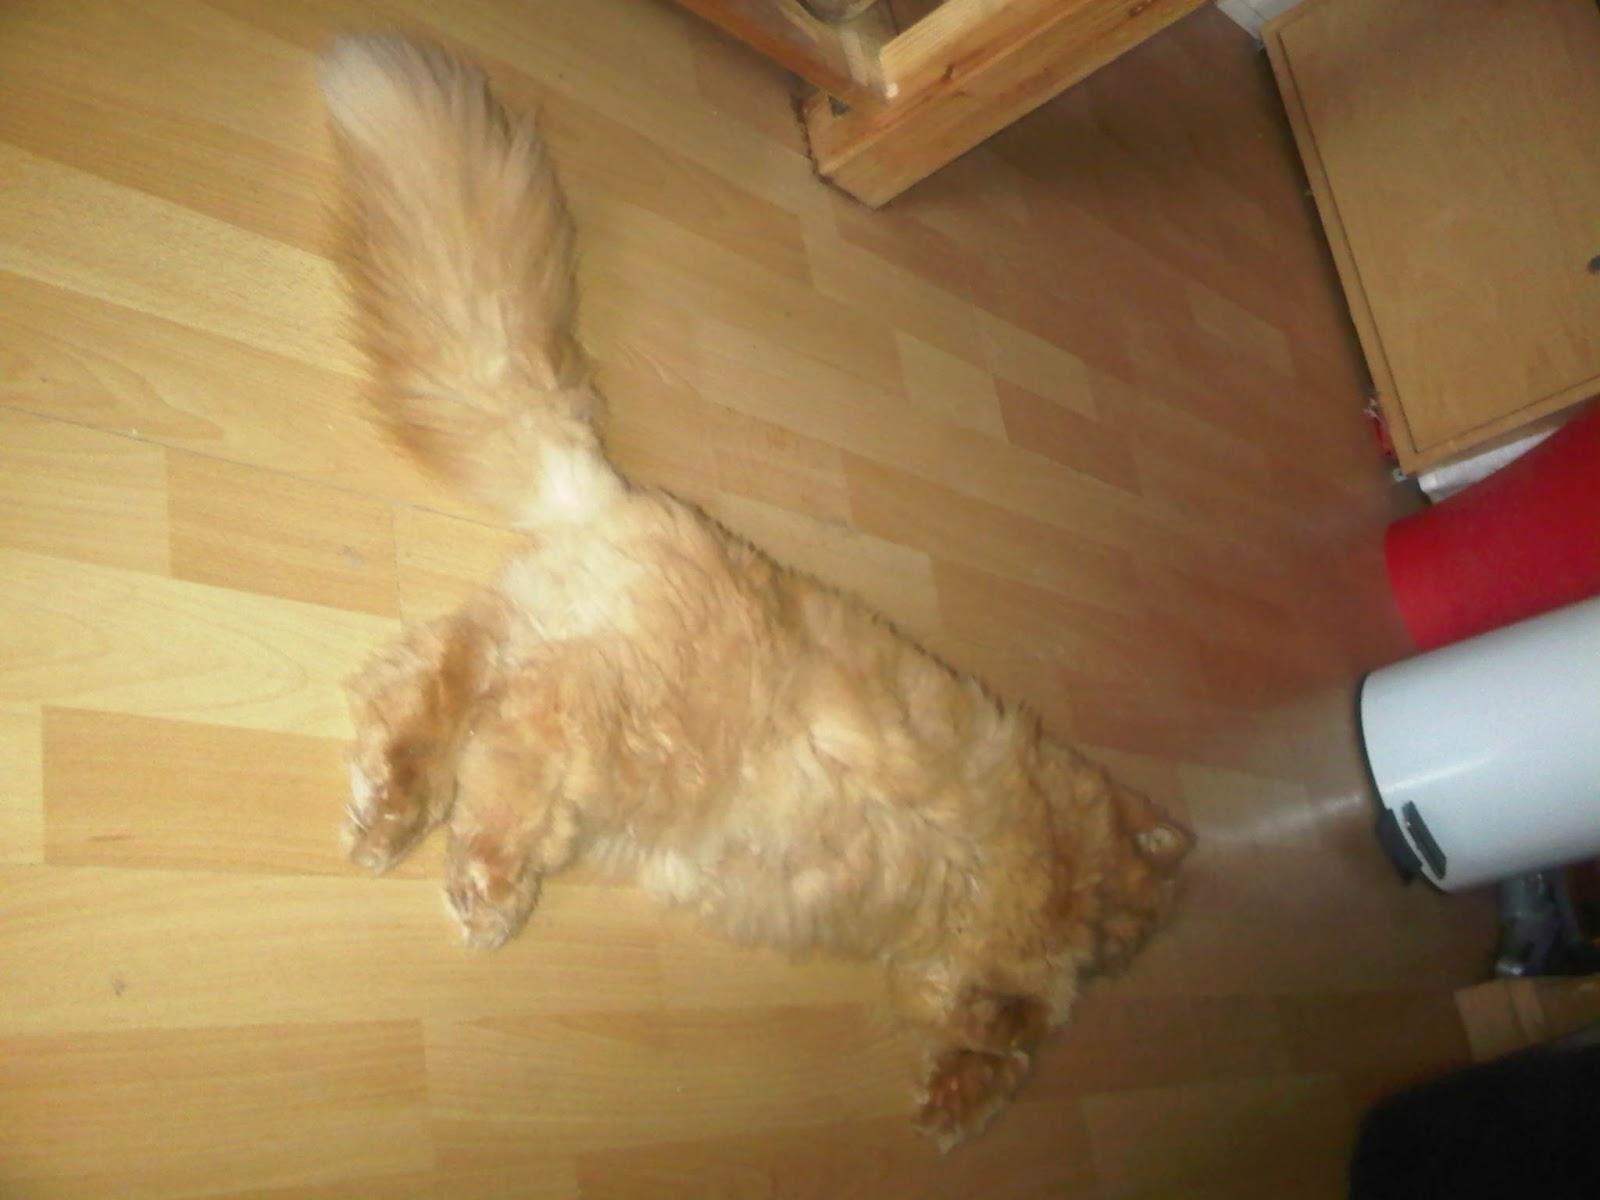 Perserkater liegt auf dem Fußboden